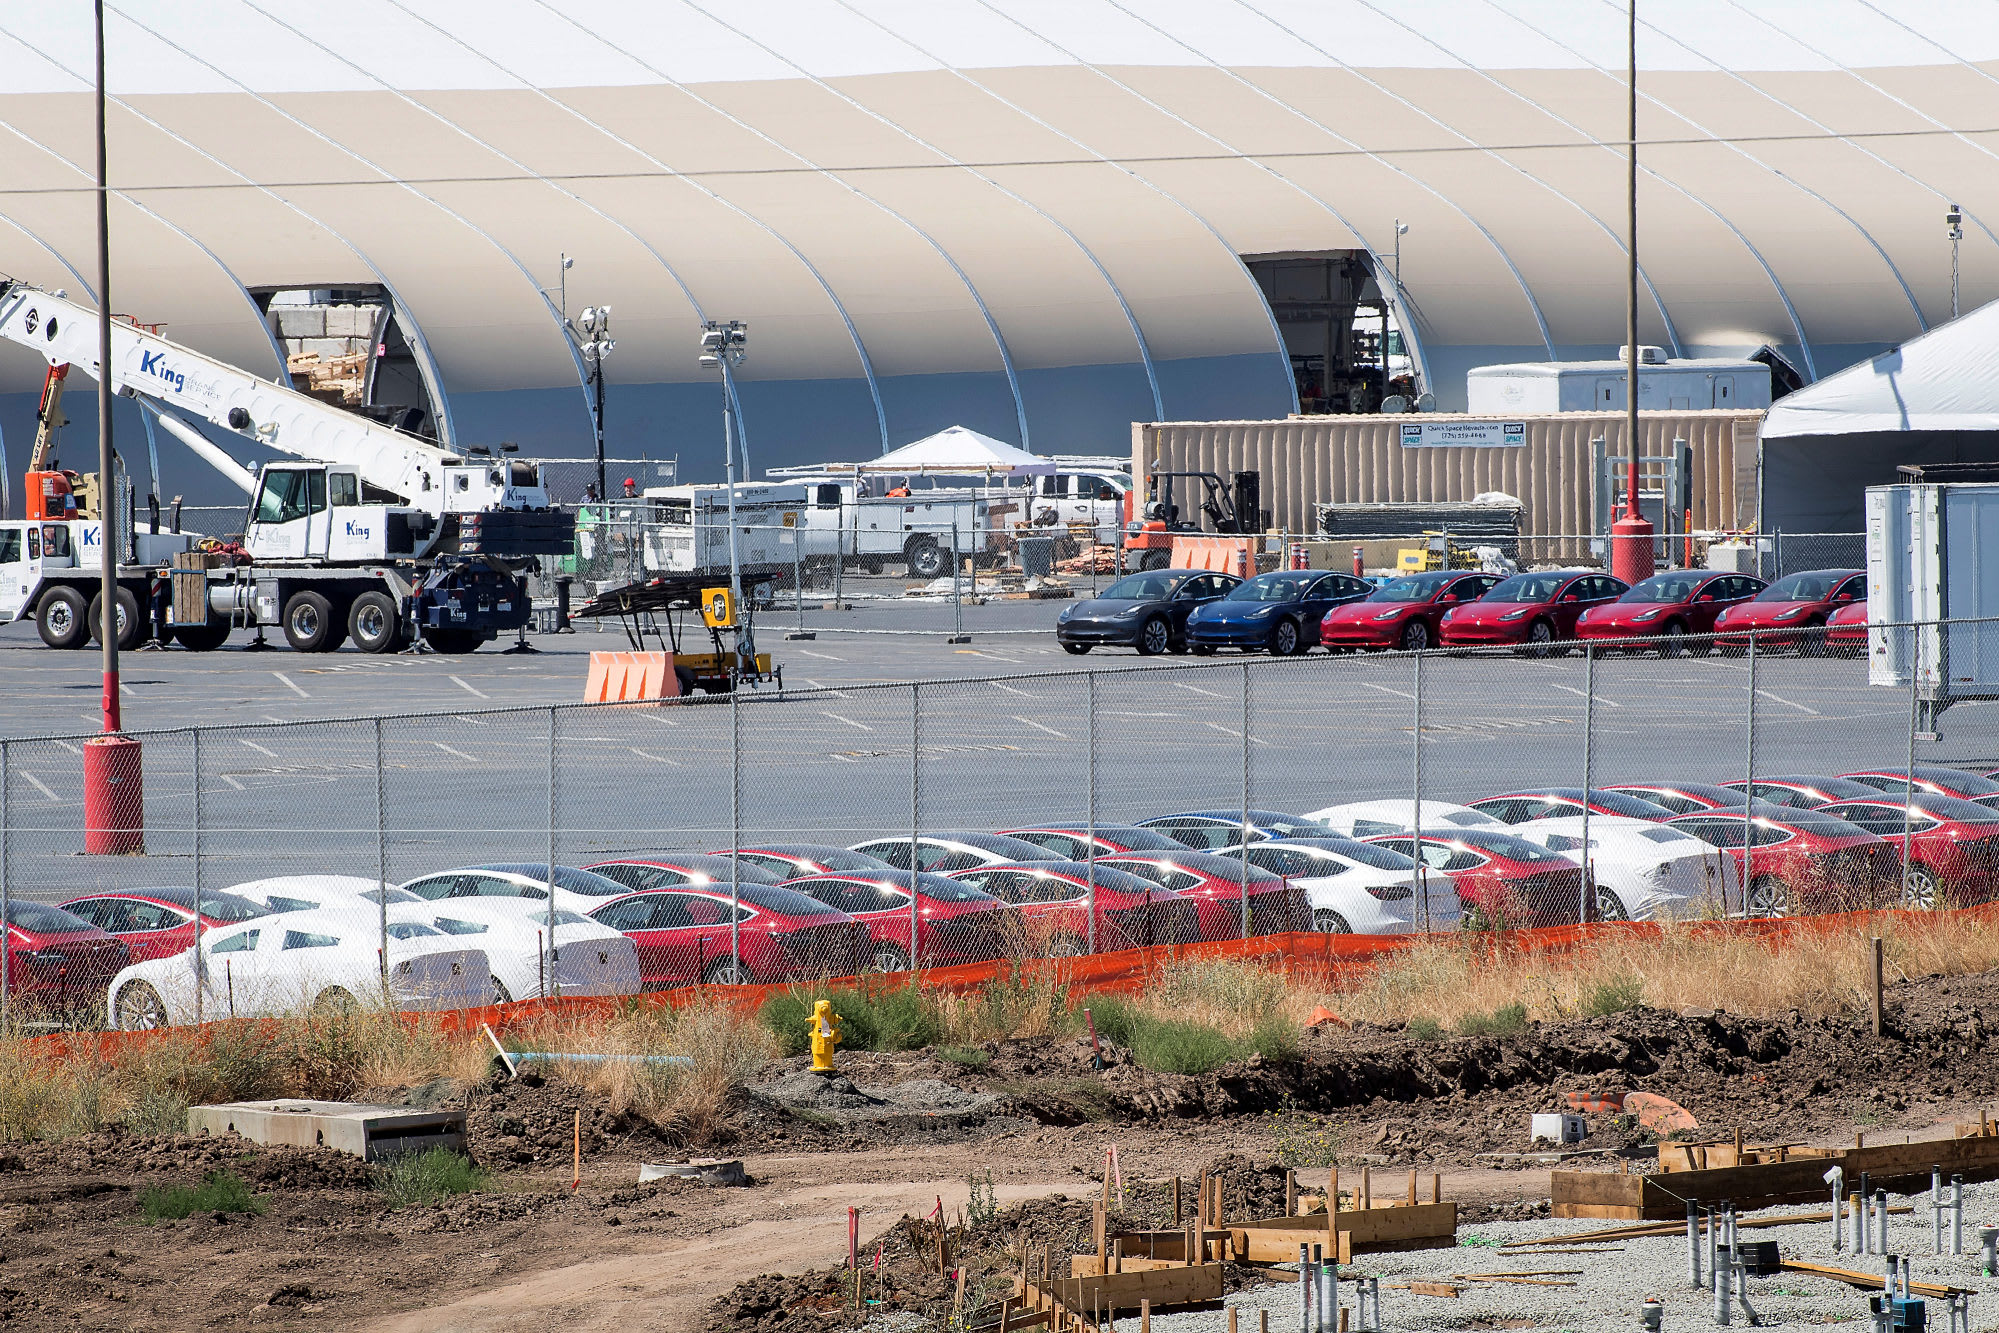 Elon Musk Loves Tesla's New Tent Factory. Others Aren't Sure